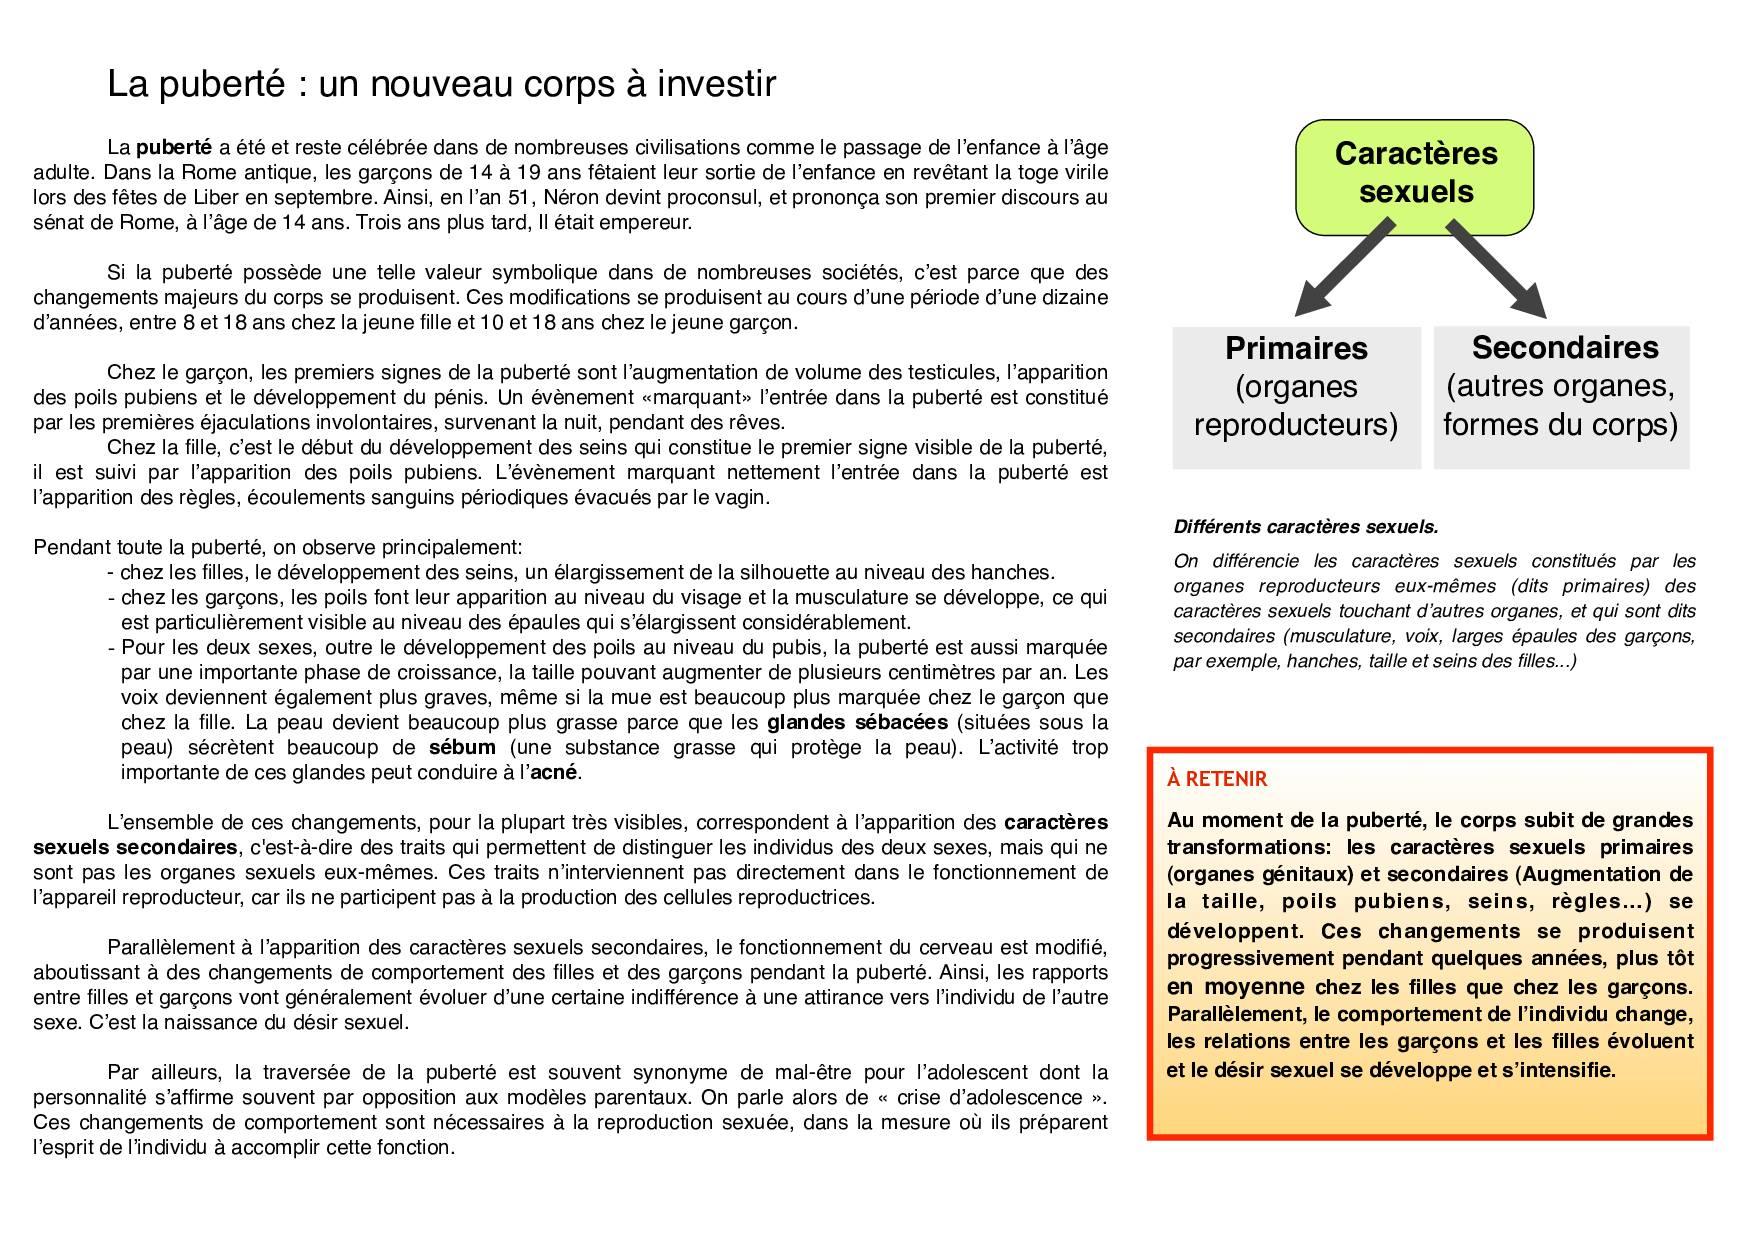 La reproduction humaine - Cours - AlloSchool